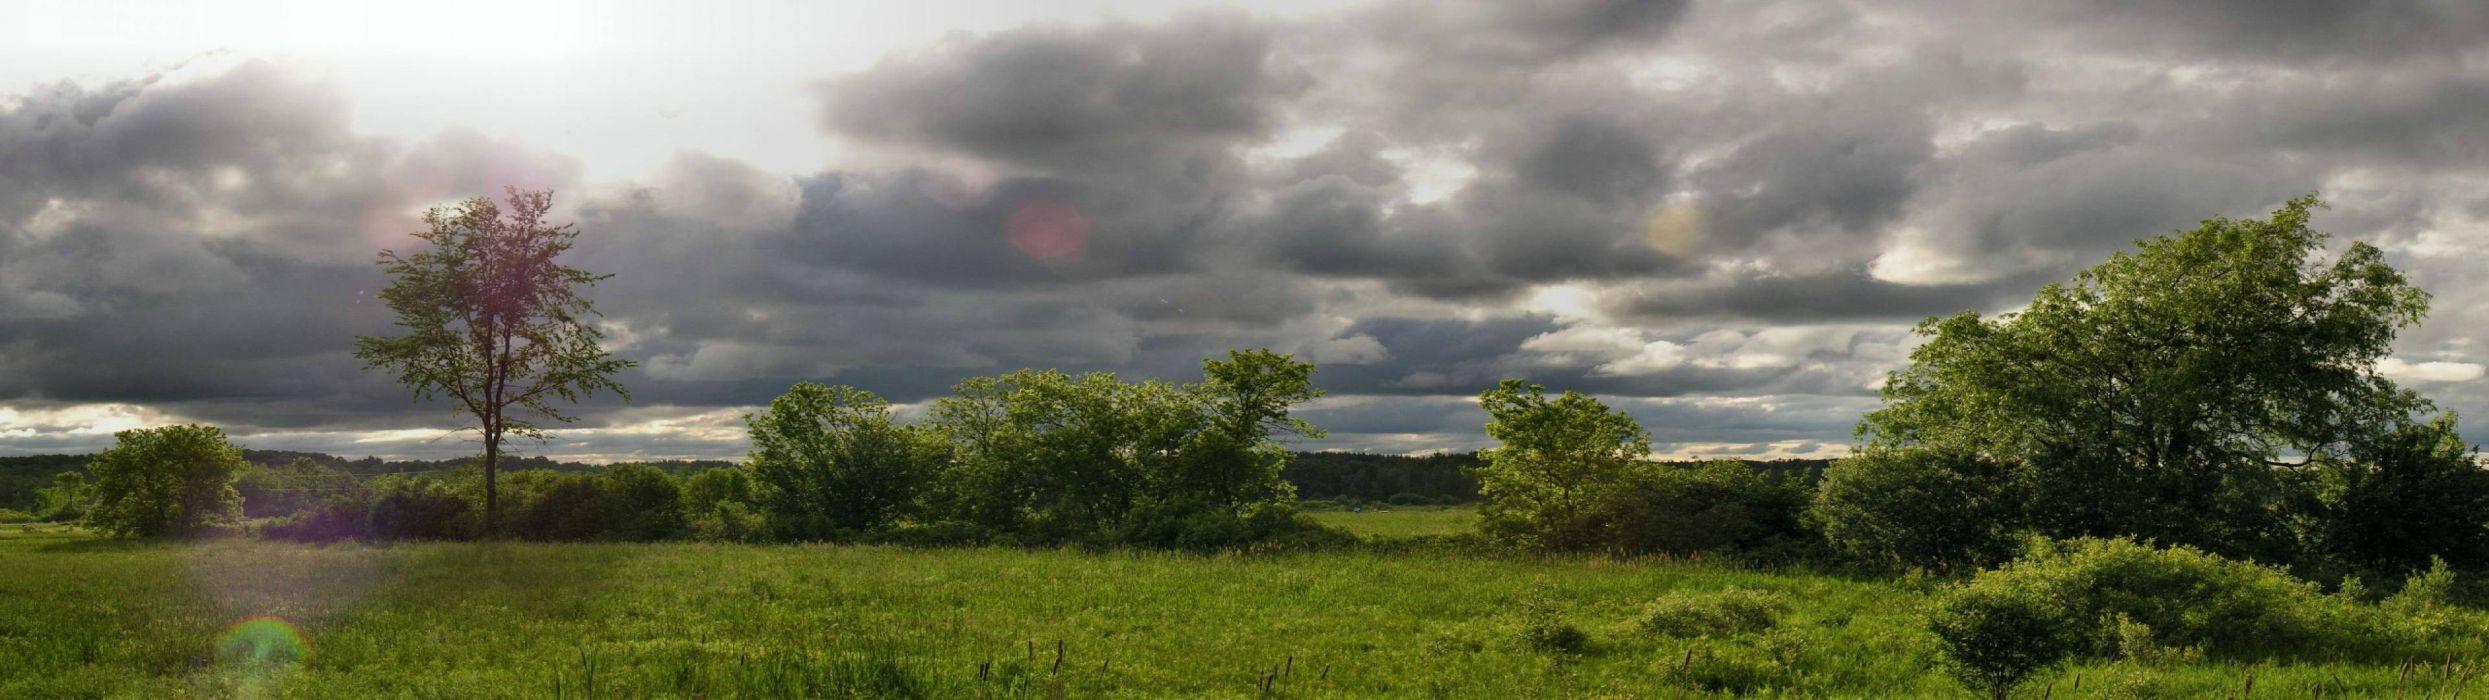 OwdLarrd Panoramic 3840x1080 wallpaper